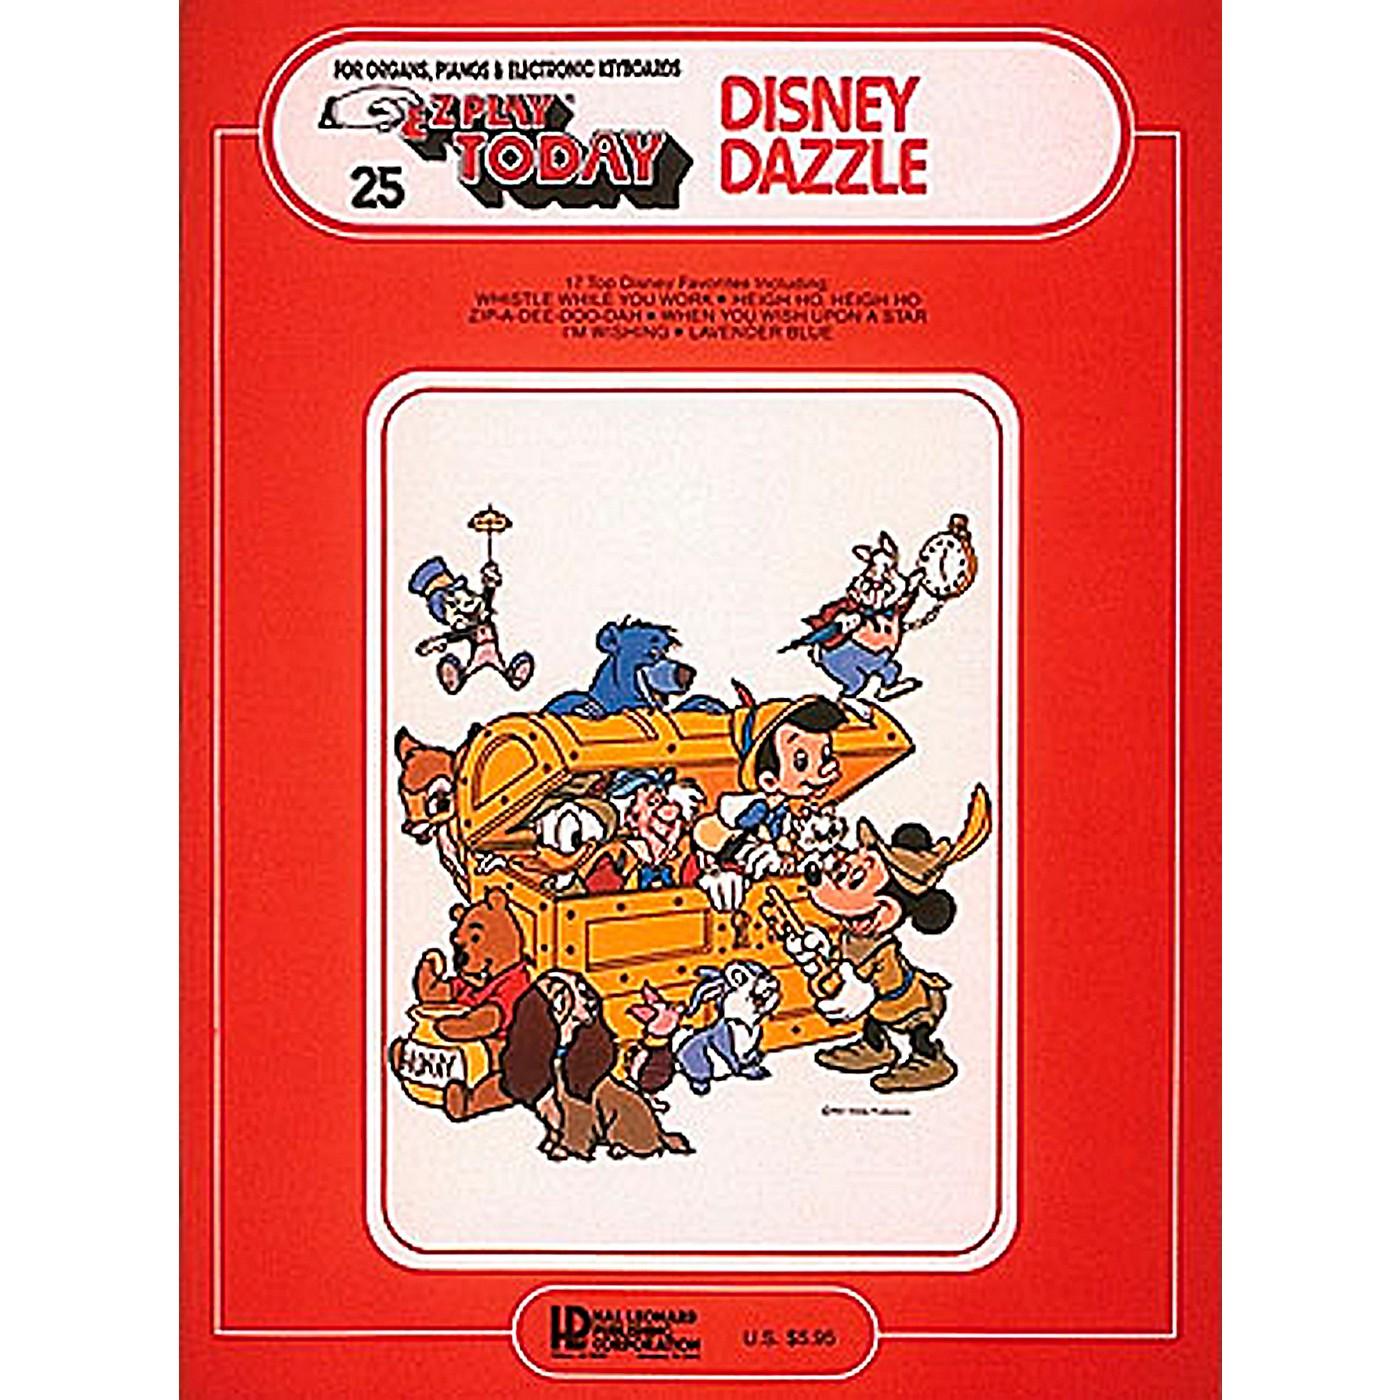 Hal Leonard Christmas Standards - Easy Jazz Play-Along Vol. 6 Book/CD thumbnail